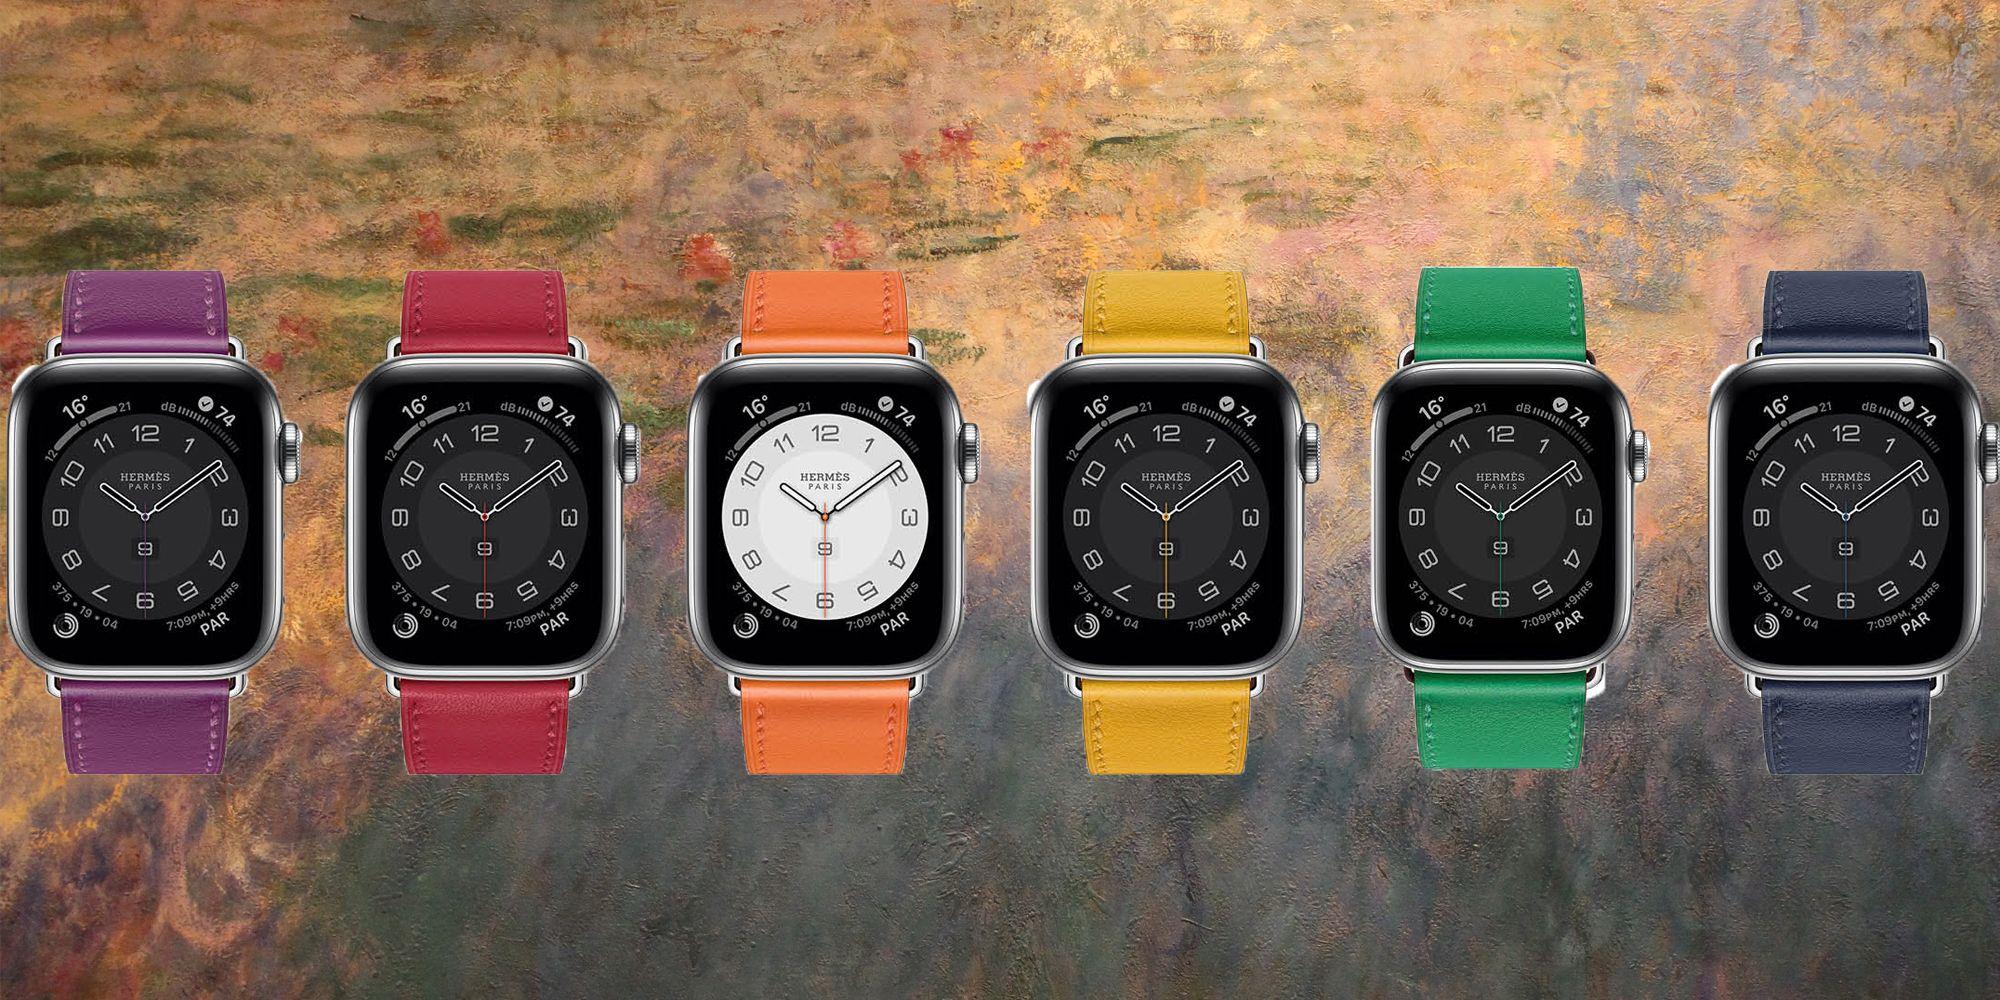 Il nuovo Apple Watch Series 6 è firmato Hermès